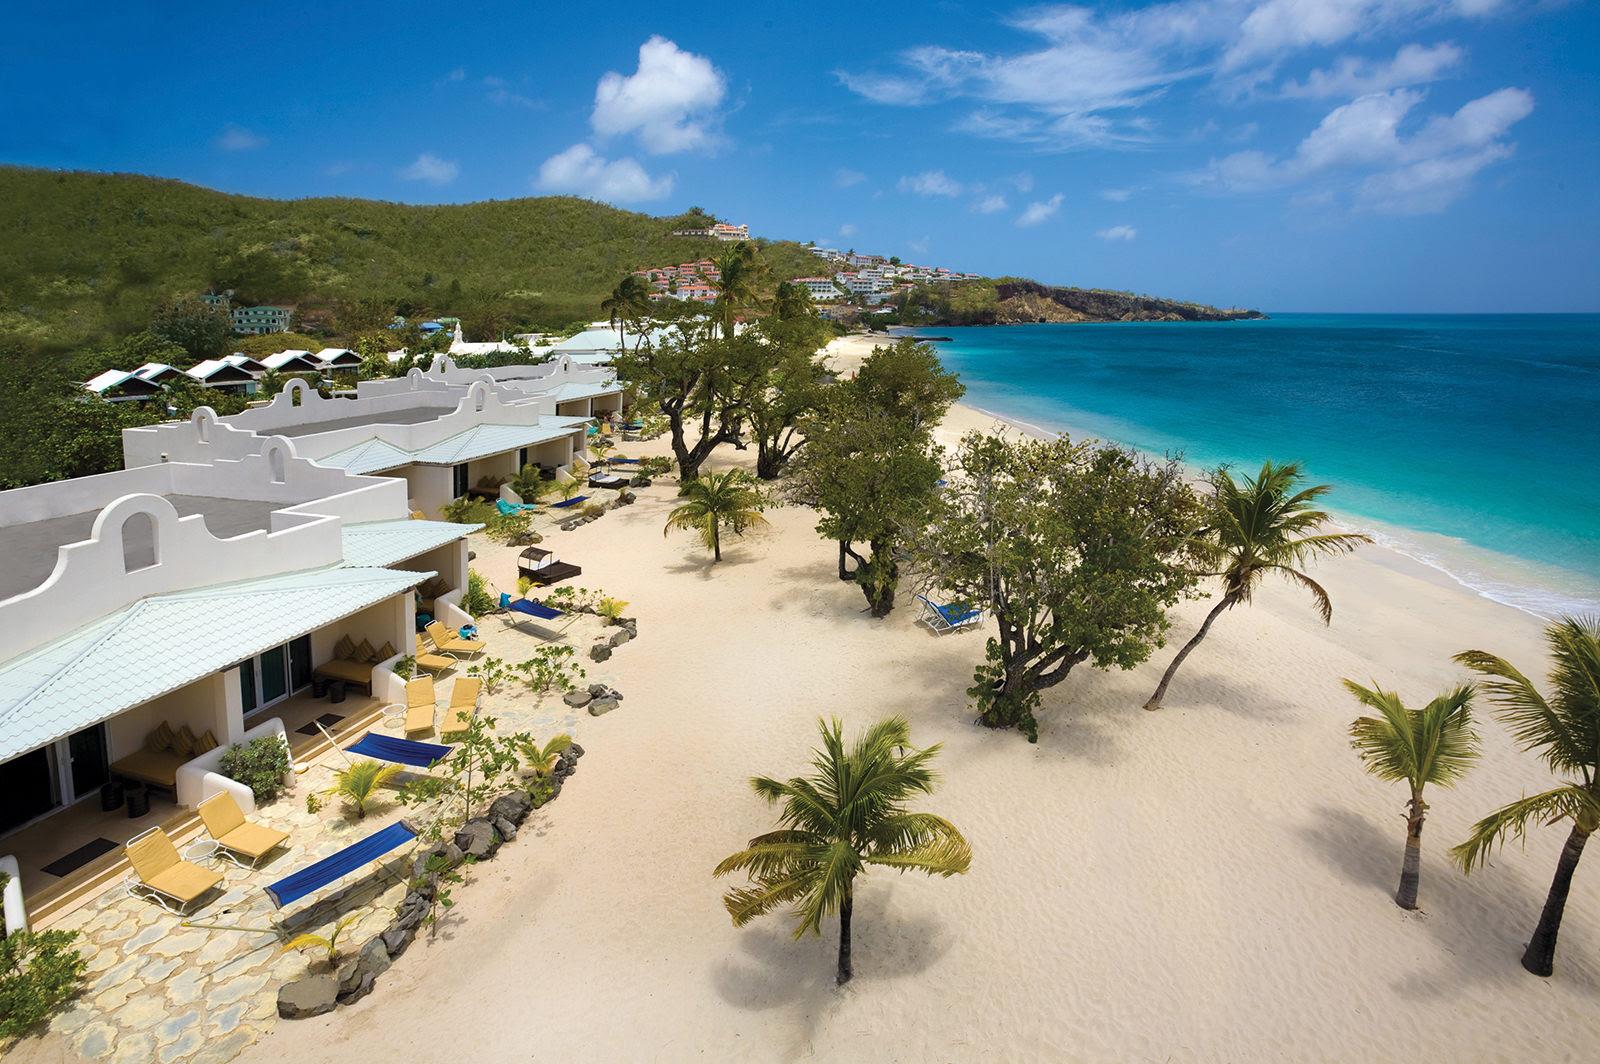 Spice Island Beach Resort  Cond Nast Johansens